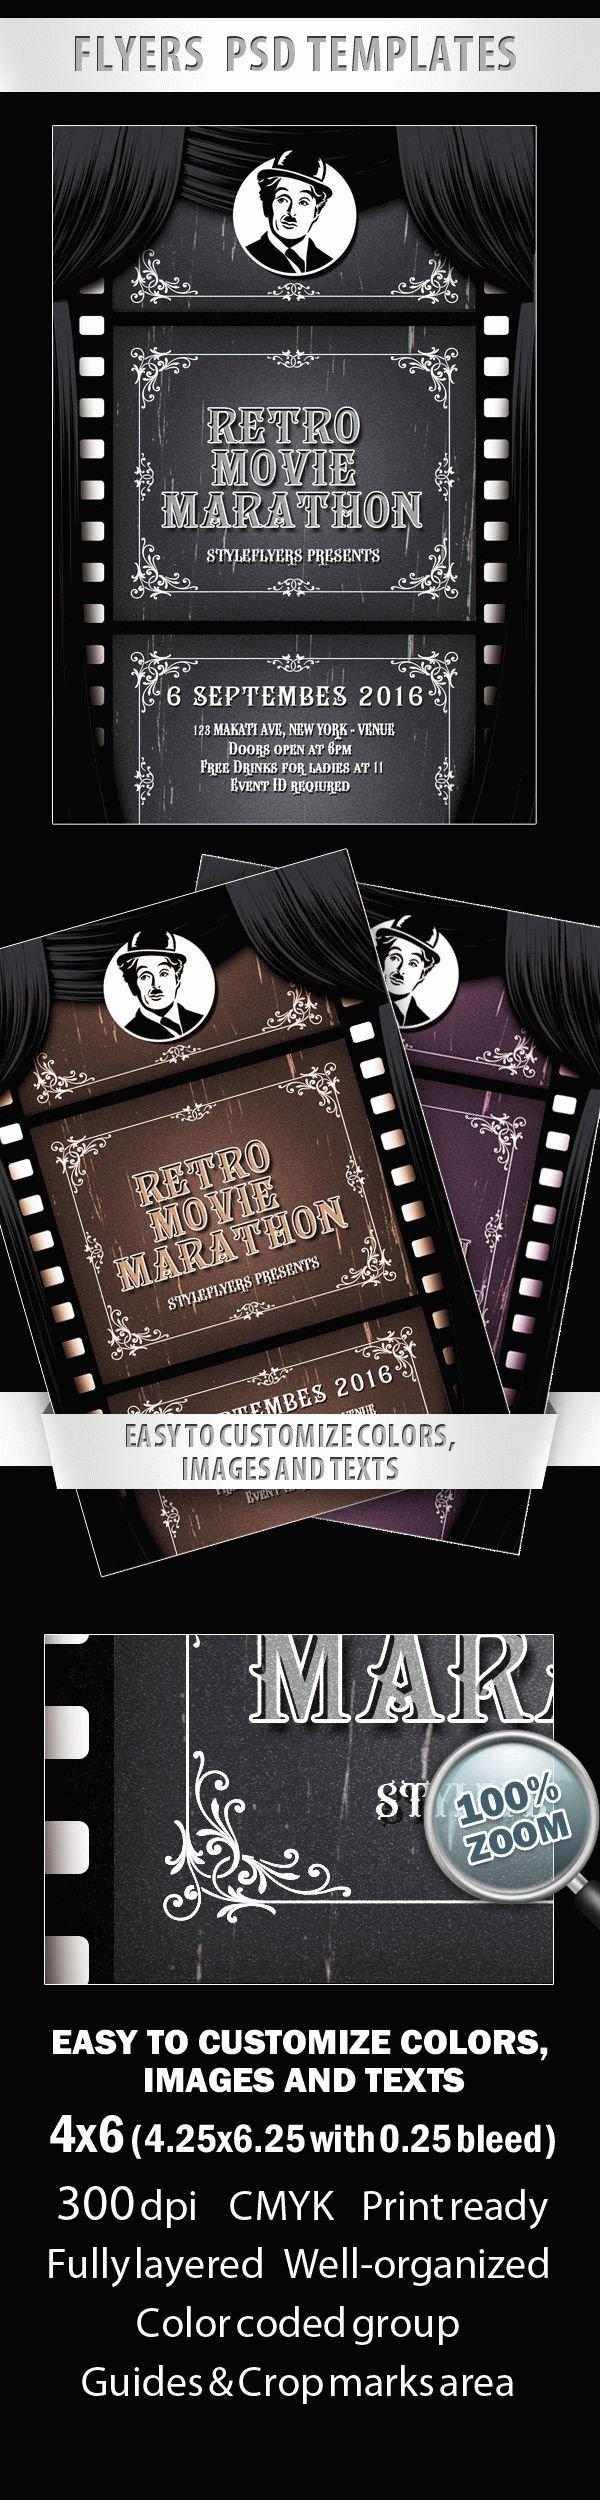 Retro Movie Marathon Flyer